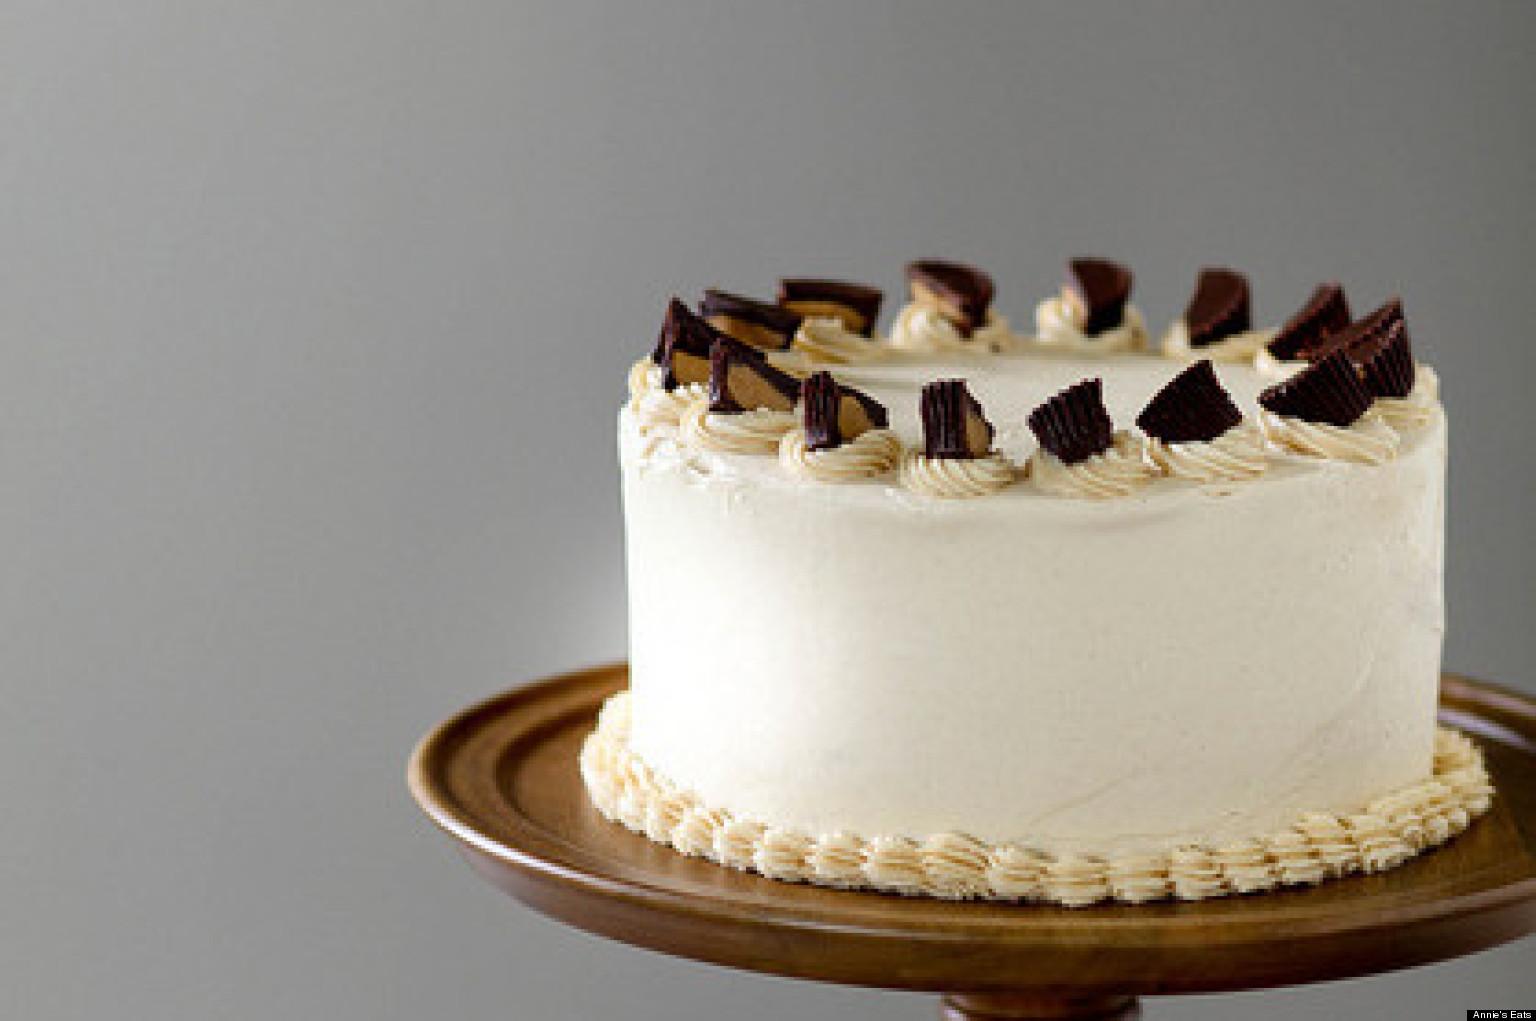 Cake Recipes Download: Cake Recipes: One For Every Occasion (PHOTOS)